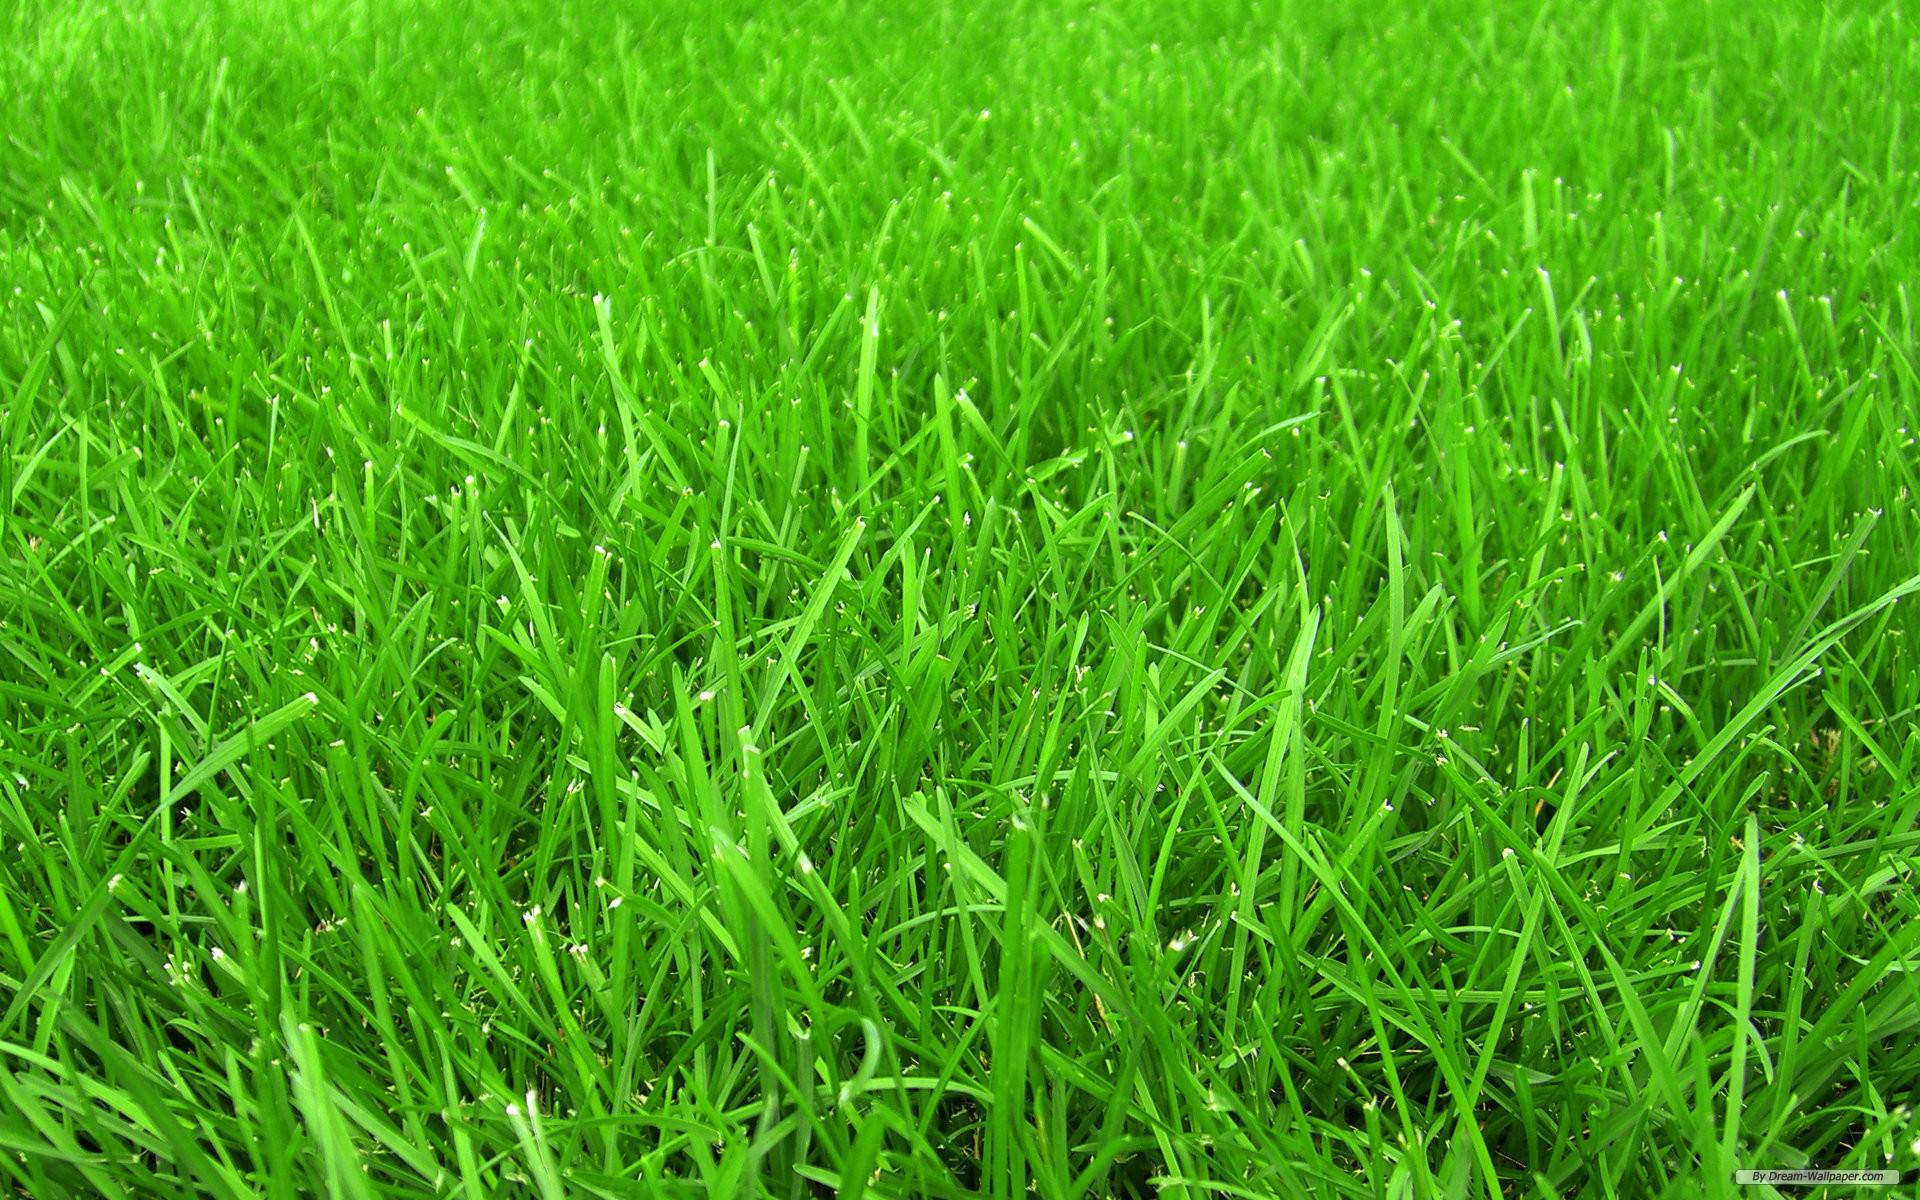 Grass Background 18876 2560x1600 px